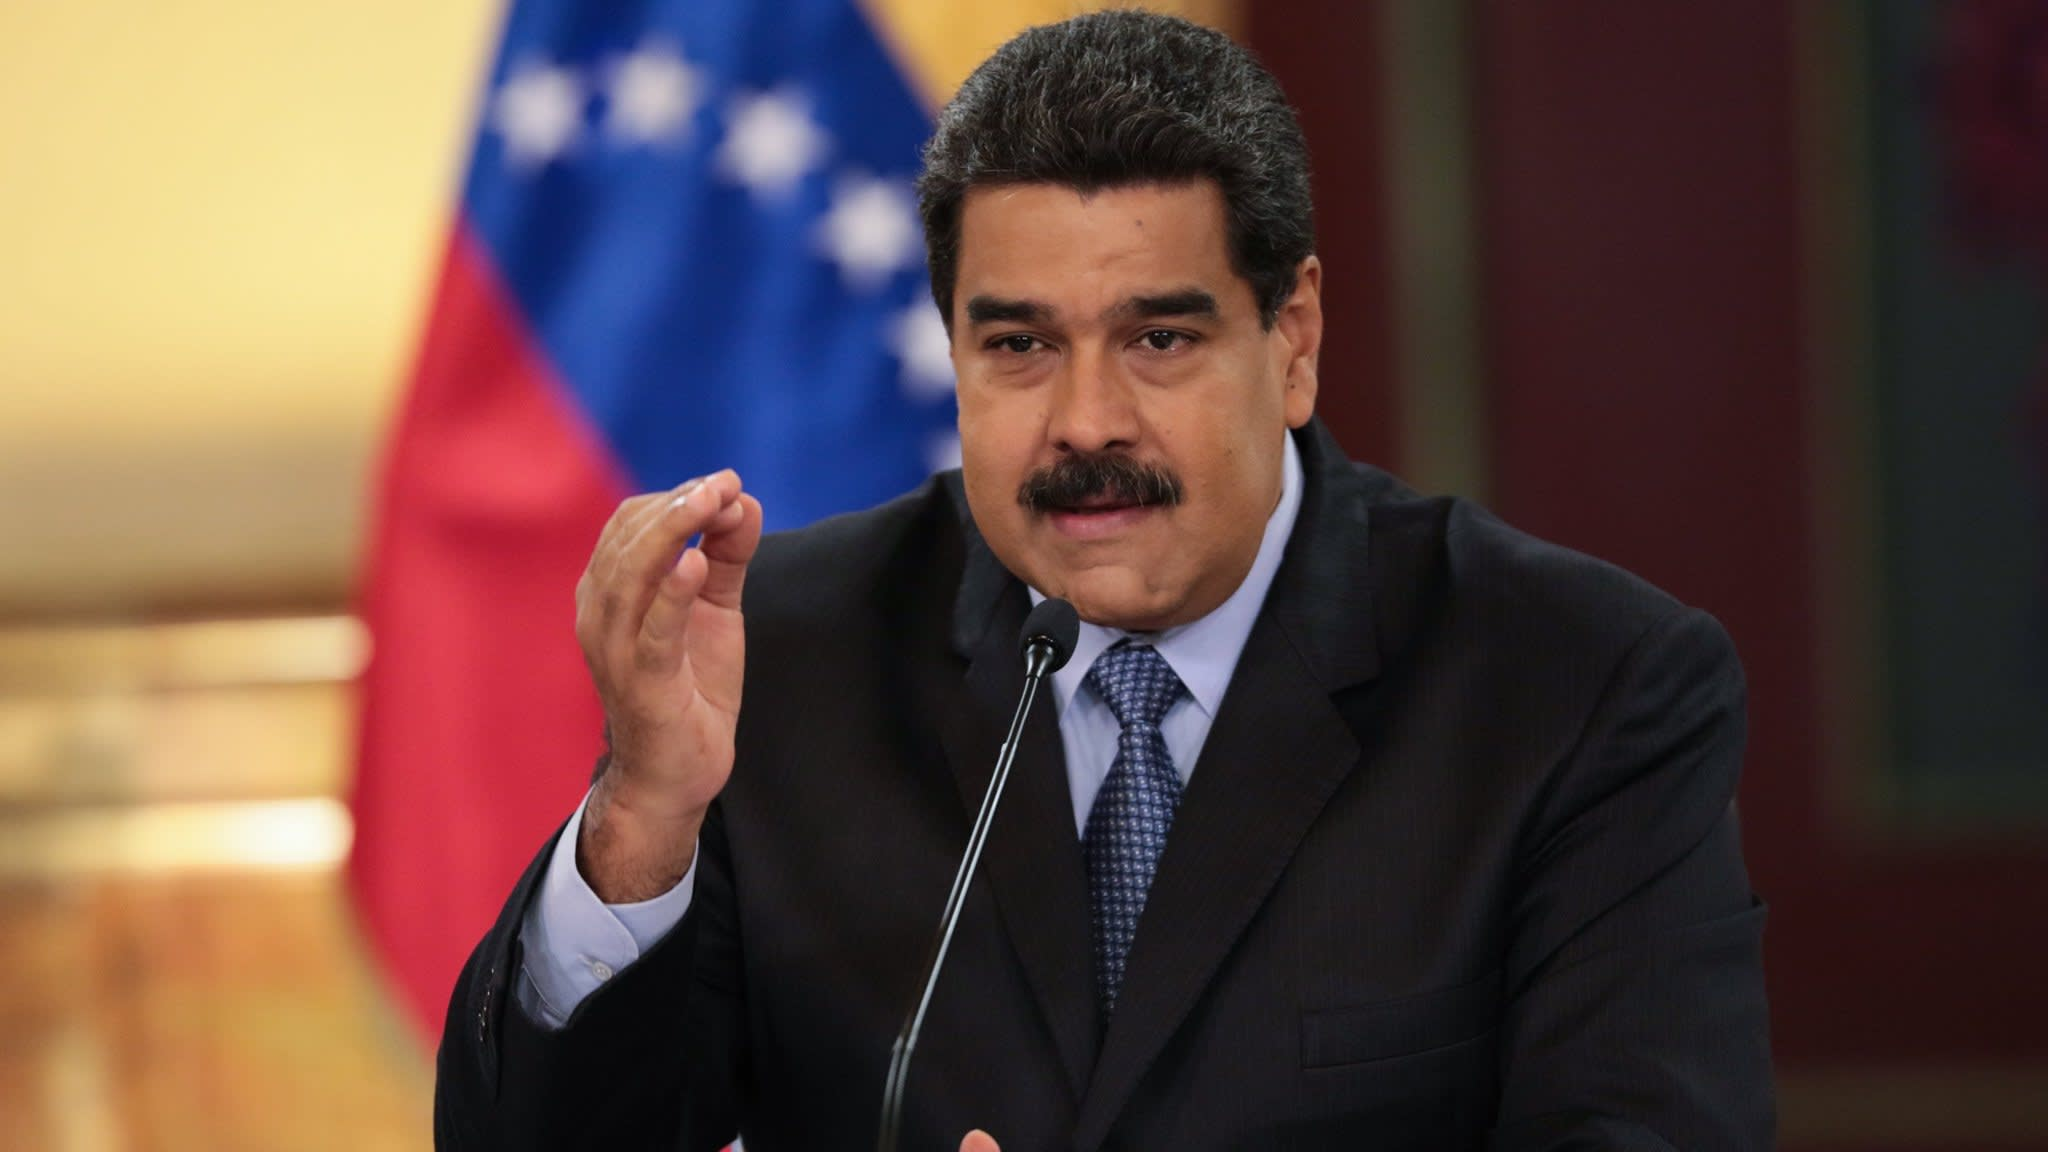 Latin American countries call for ICC to probe Nicolas Maduro